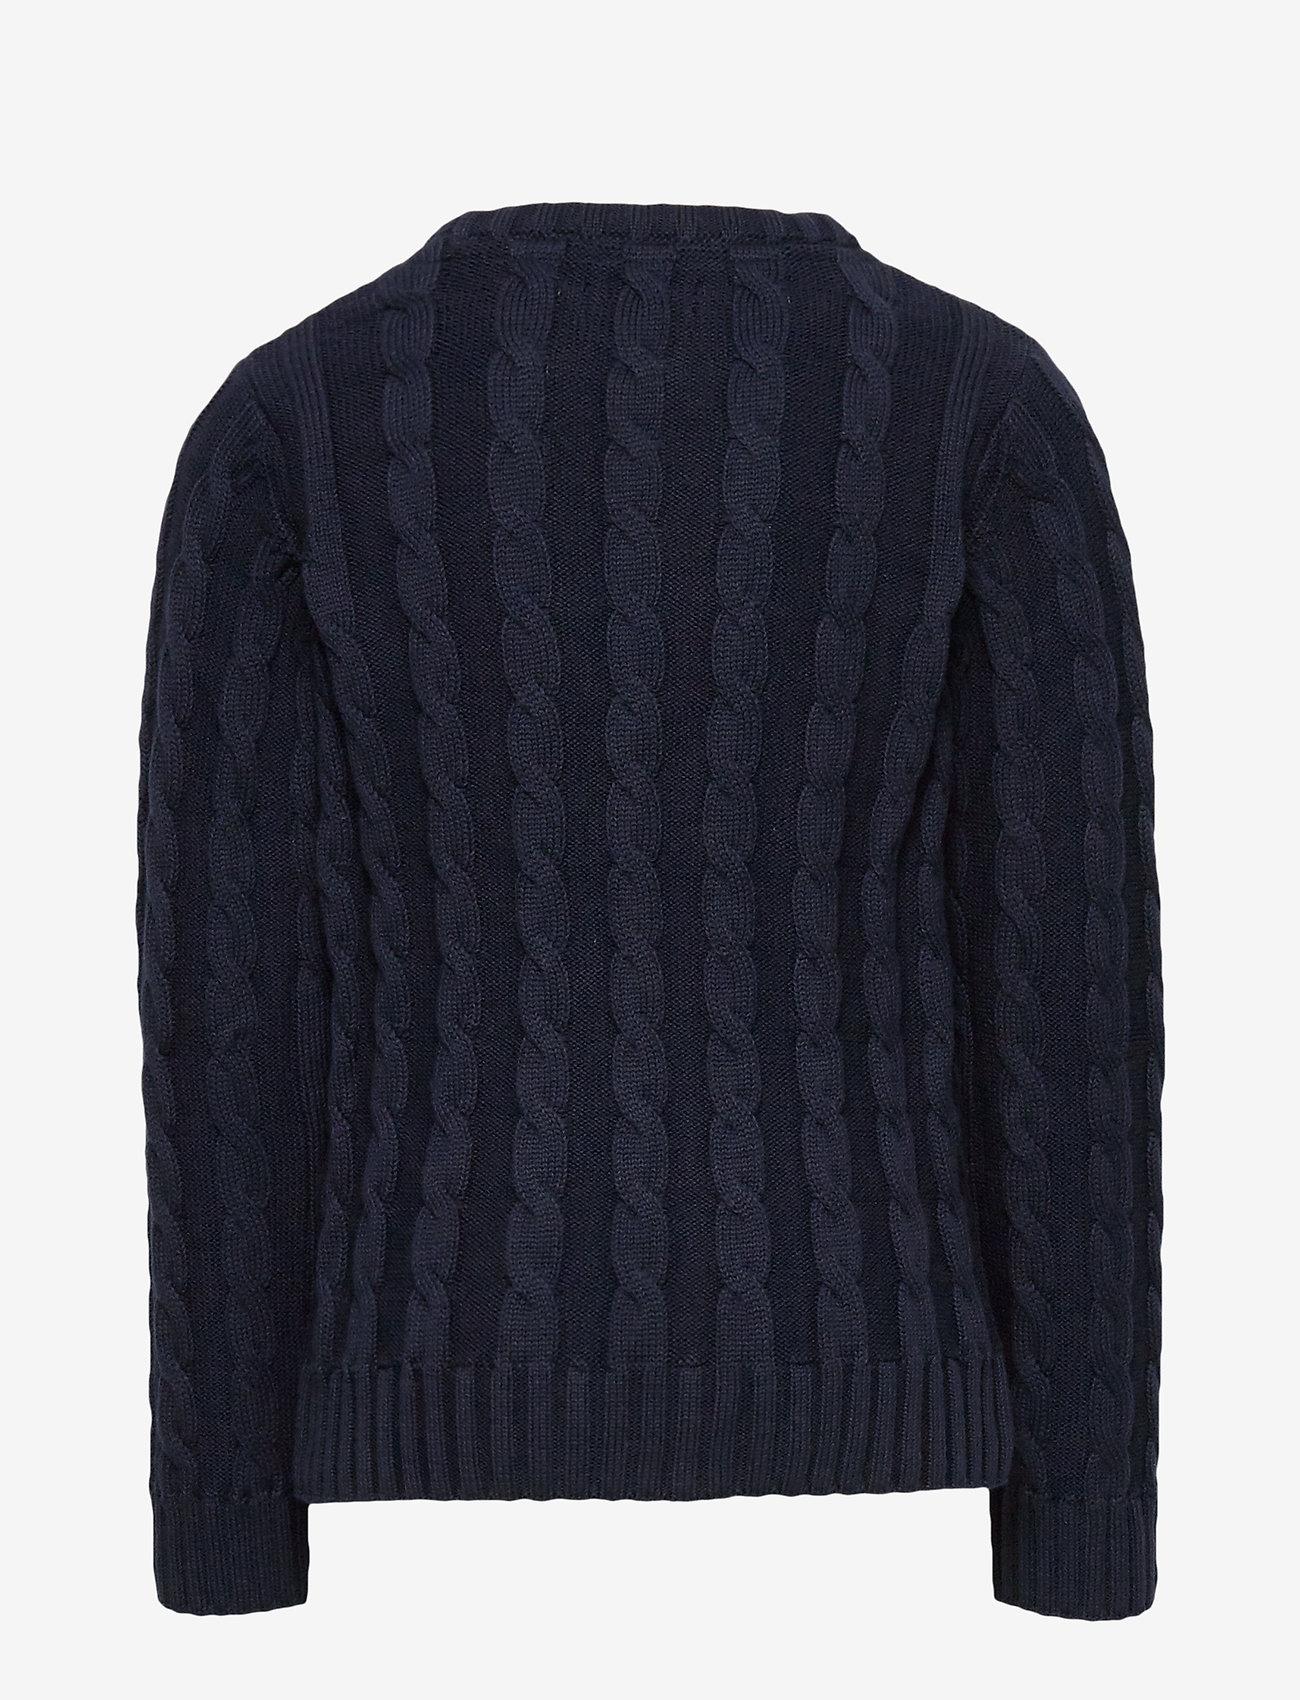 GANT - COTTON CABLE CREW - knitwear - evening blue - 1